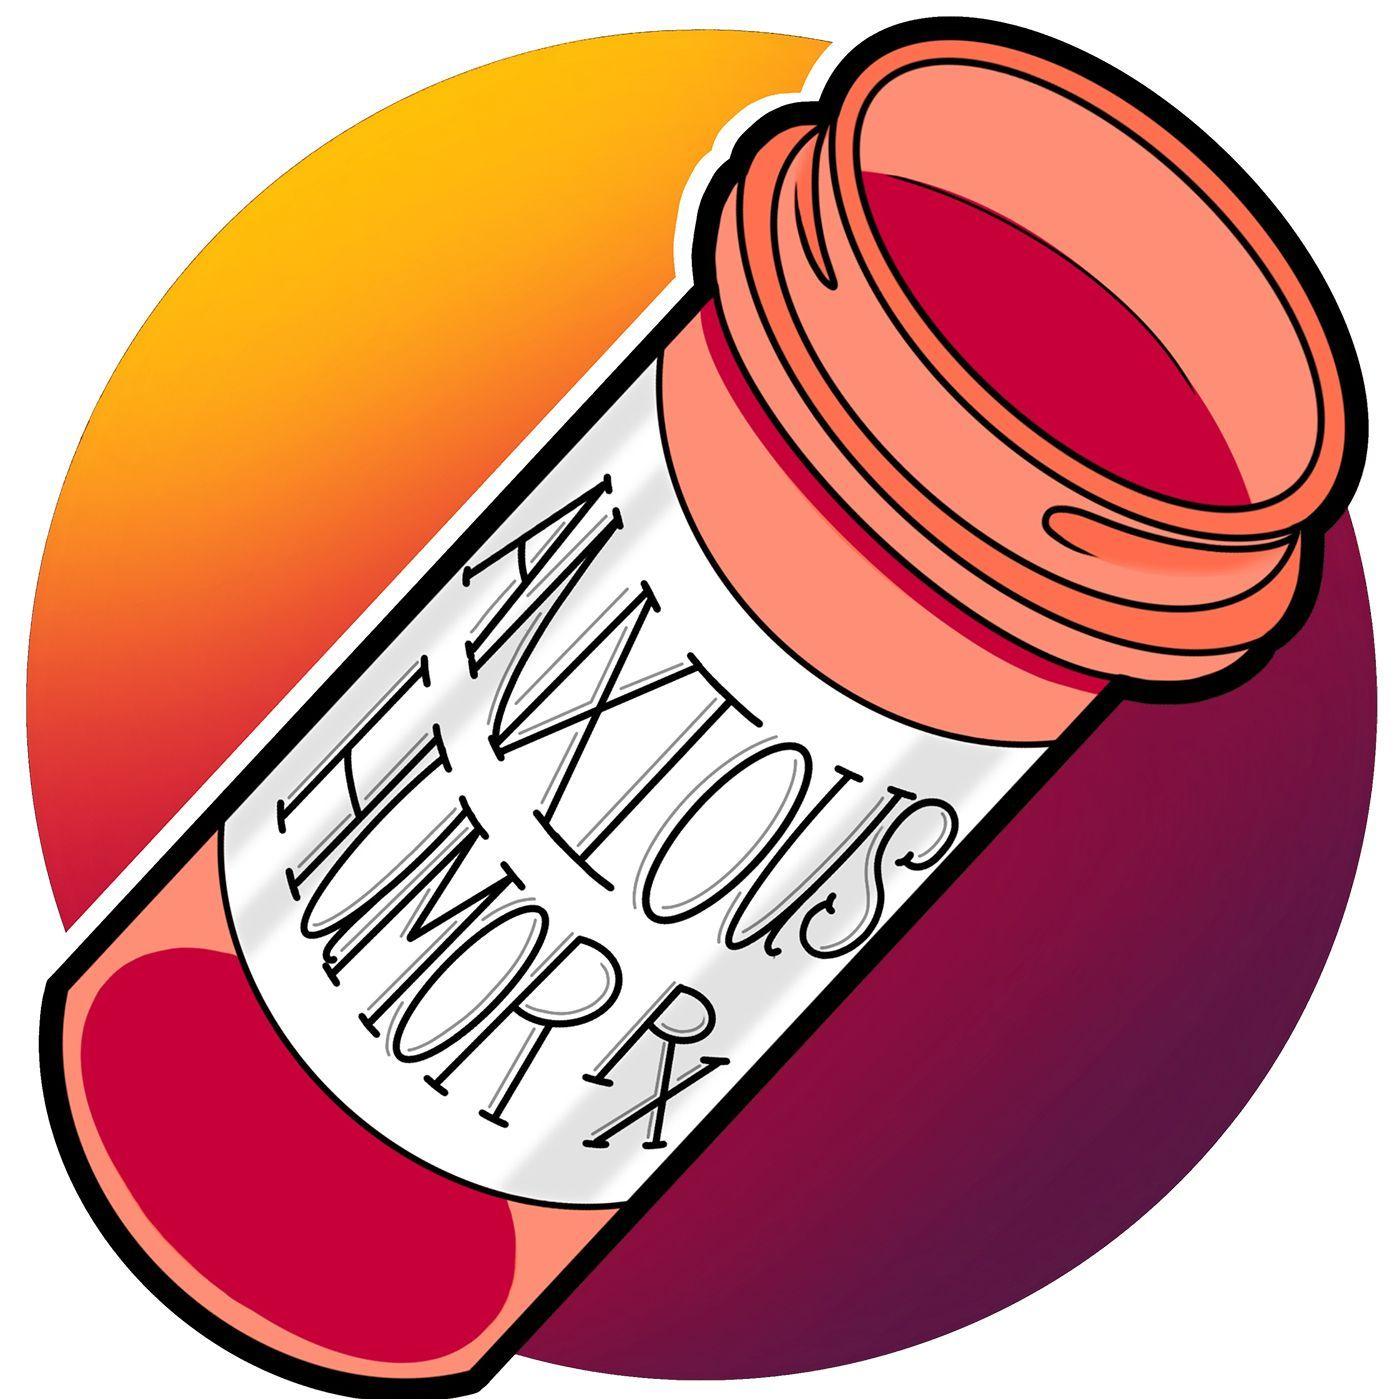 Anxious Humor 7: Disingenuous With Samuel